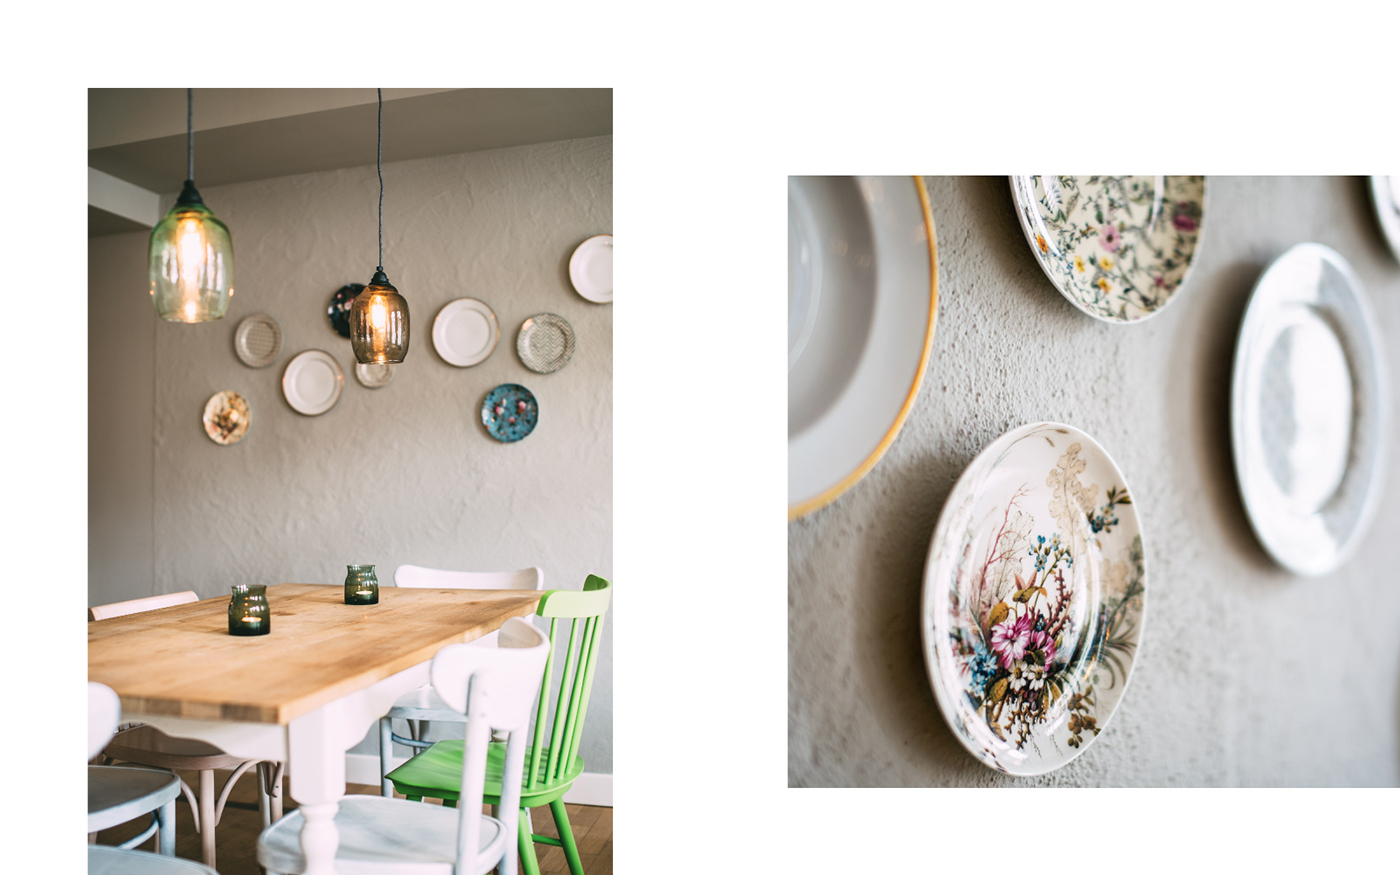 Gruener Michel-branding-interior design-hisheji (6)